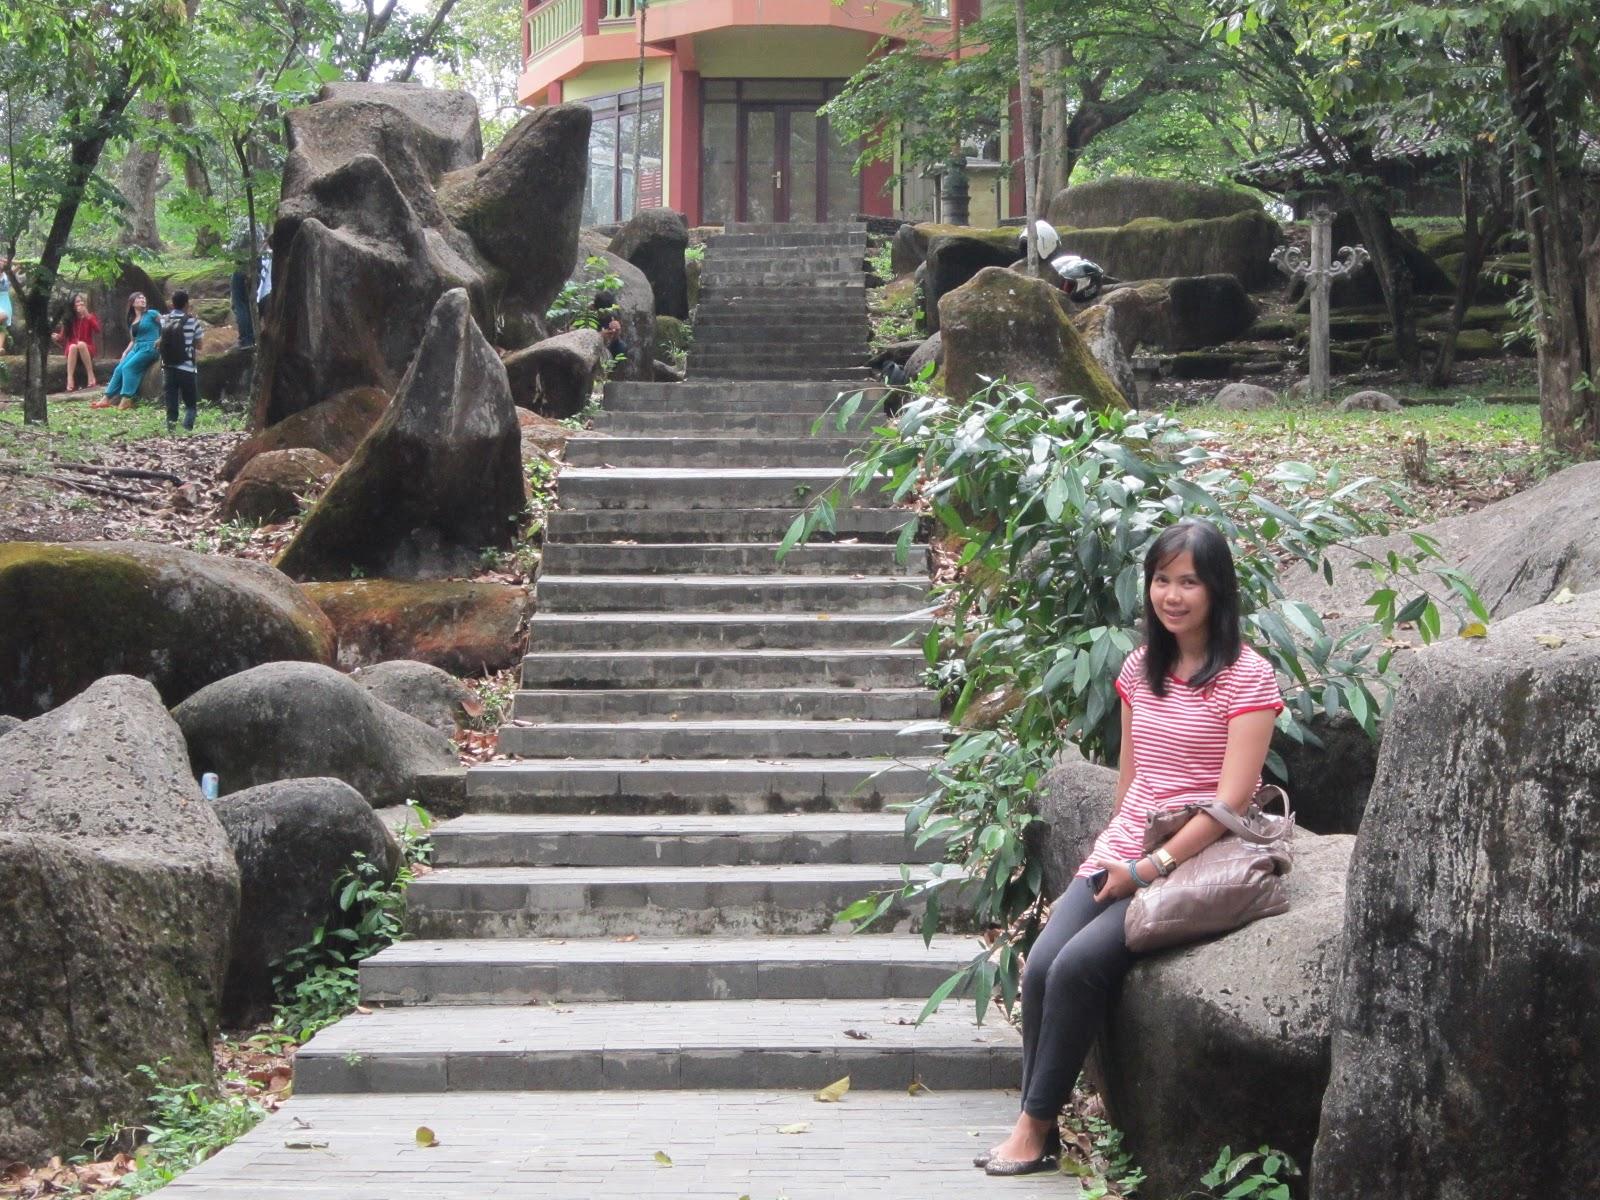 Lil Greeny Palembang 2012 Setelah Taman Purbakala Bukit Siguntang Tujuan